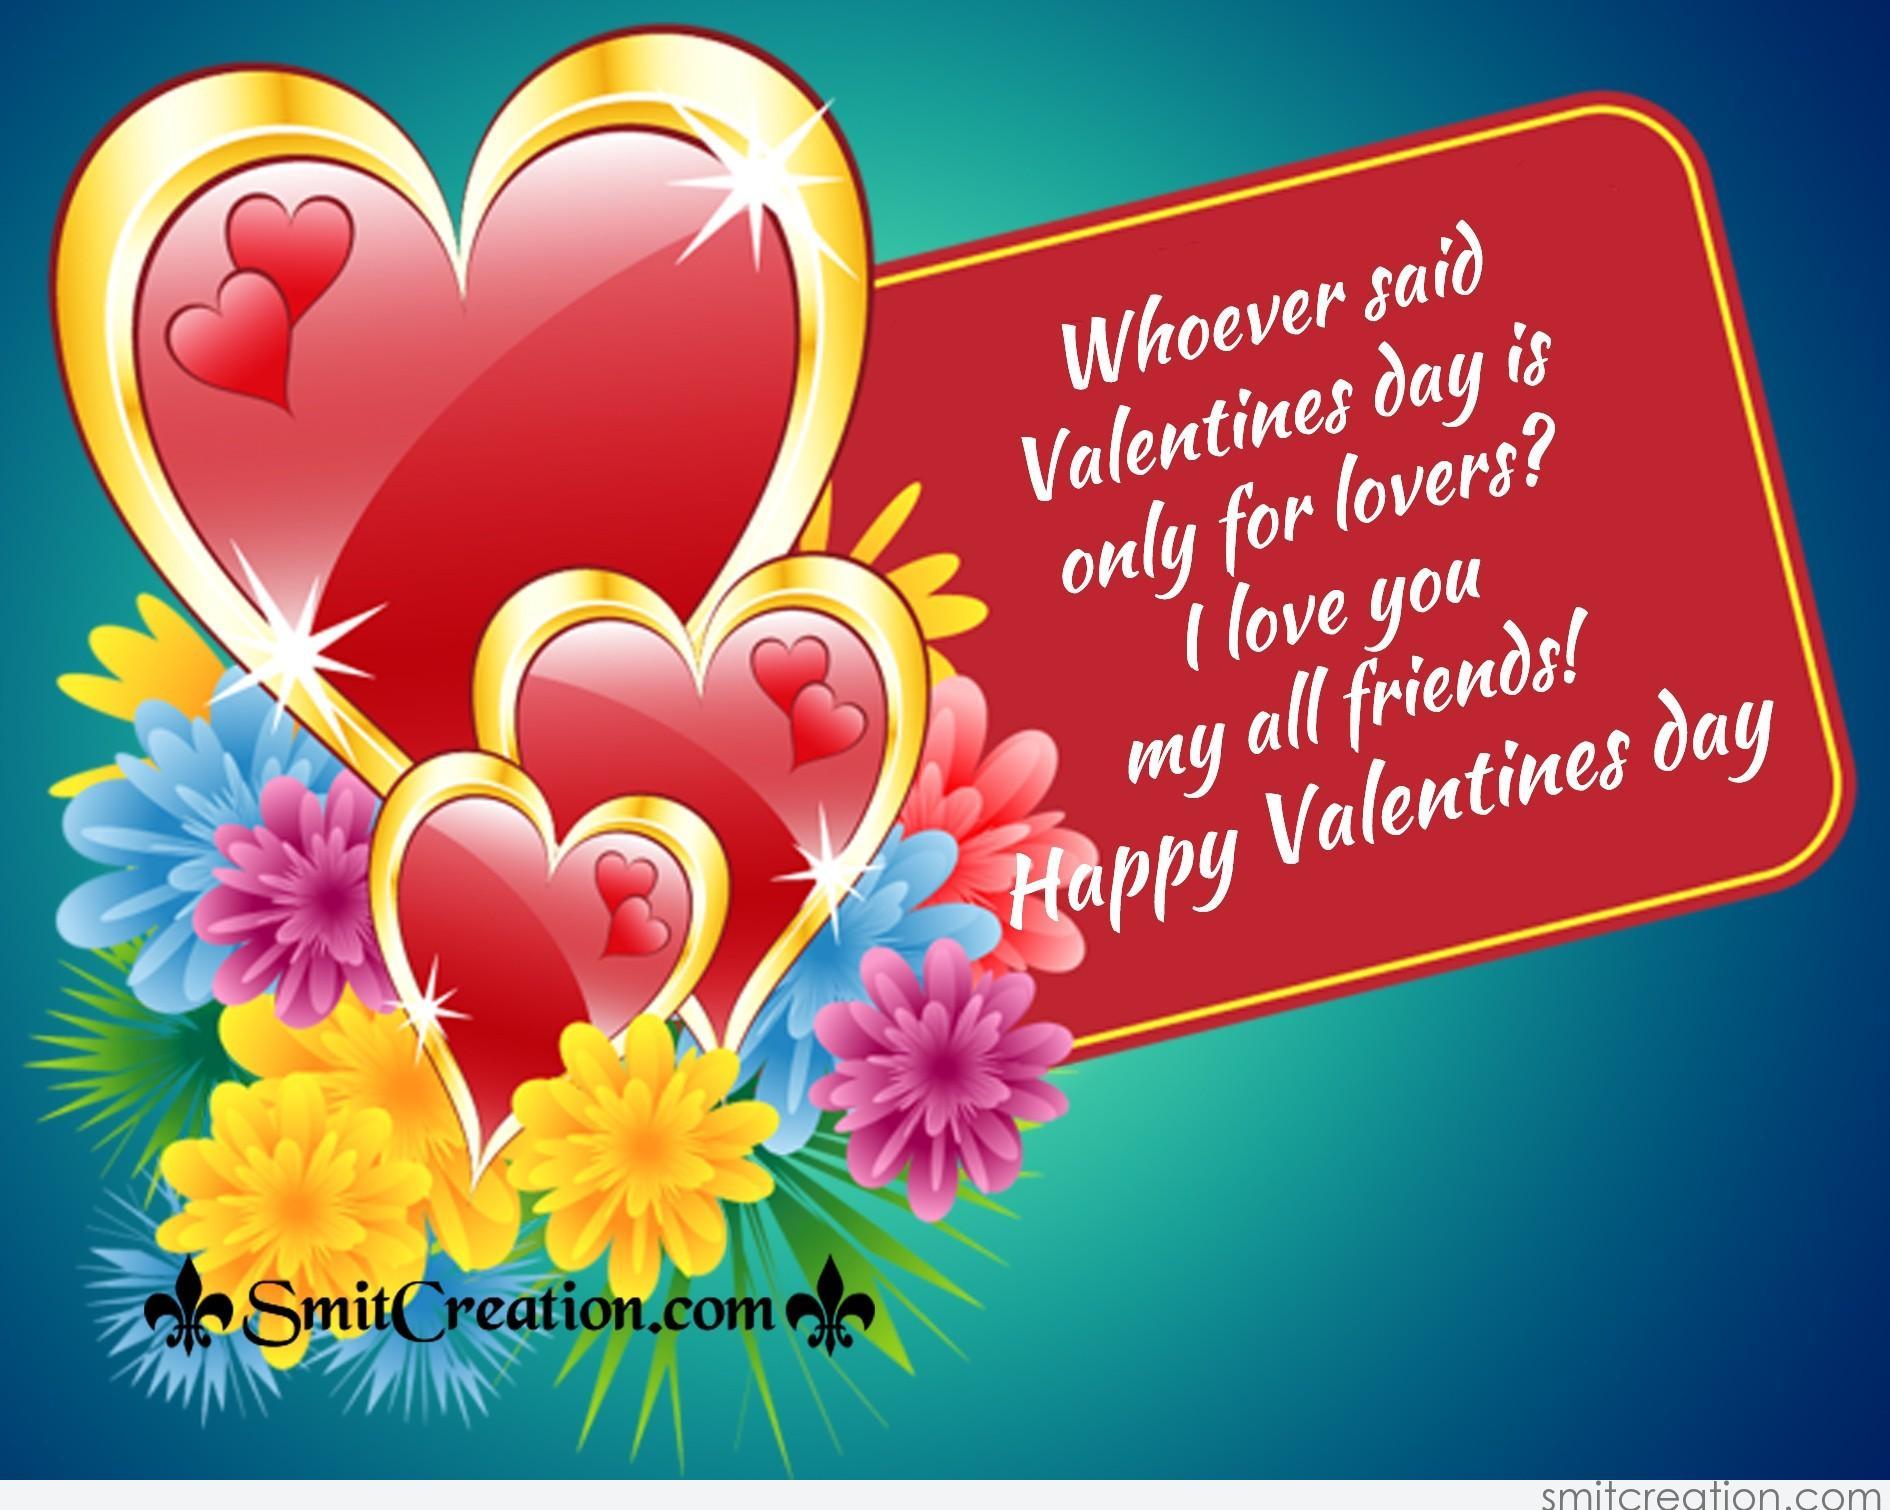 Radiant Hindi I Love You My Friend Pics I Love Youmy All Happy Valentines Day Dear Friend I Love You My Friend Download Whoever Said Valentines Day Is Only inspiration I Love You My Friend